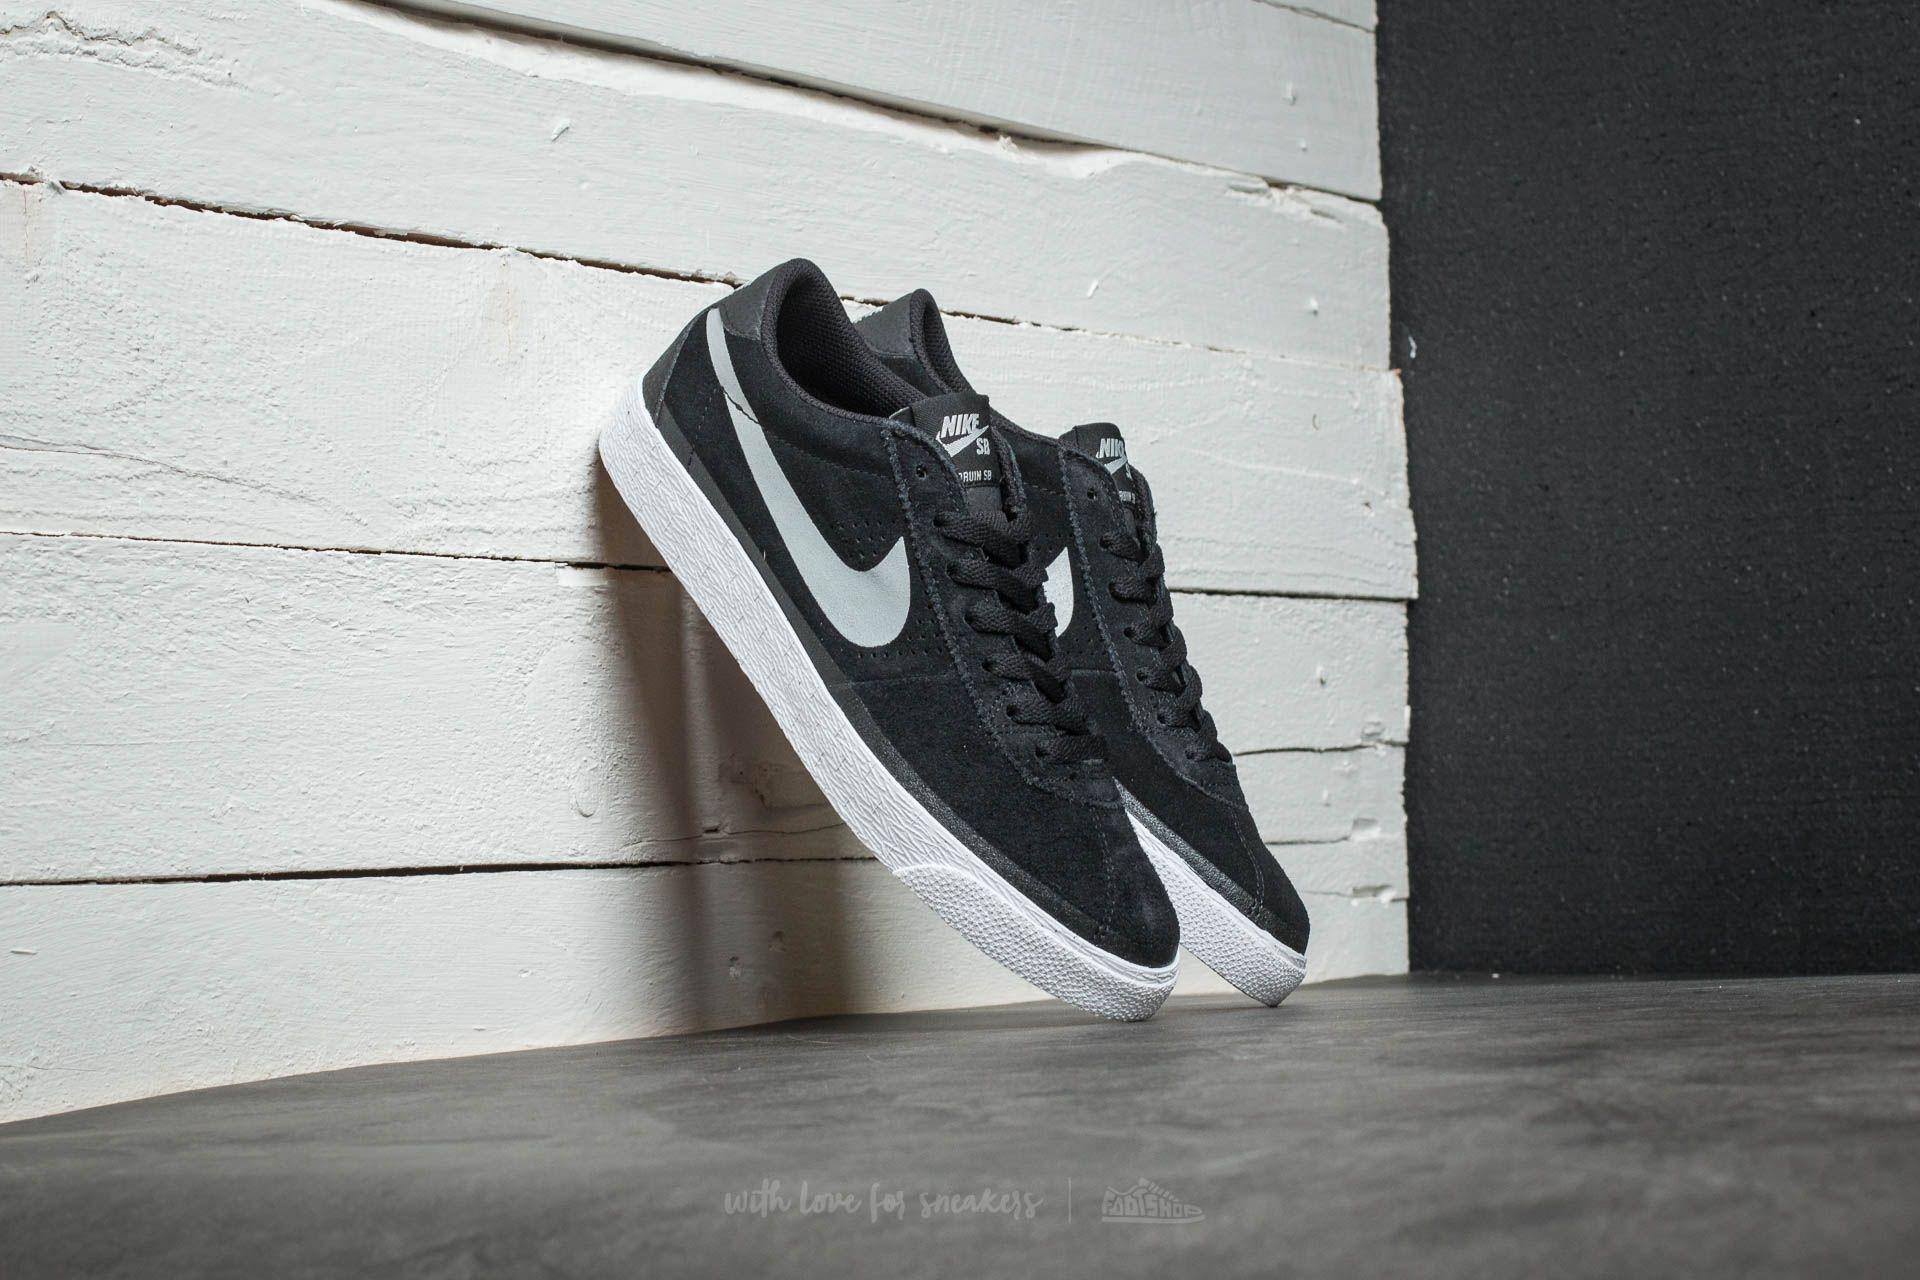 Nike Bruin SB Premium Se Black Base Grey White   Footshop